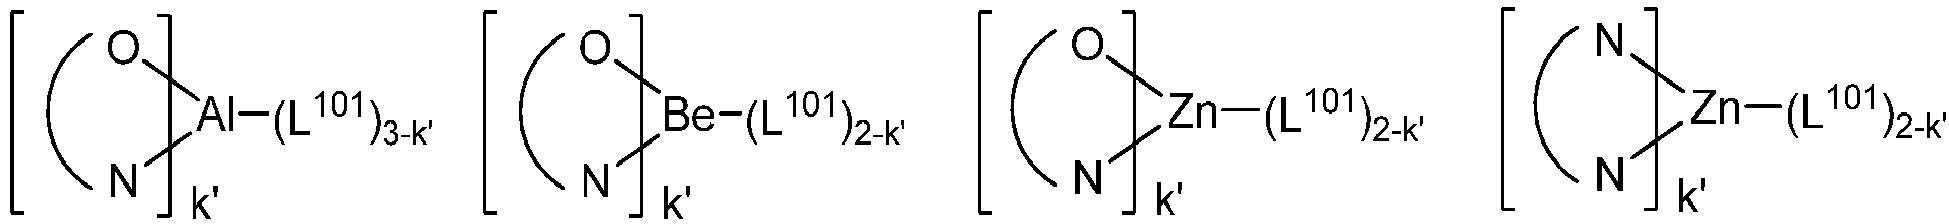 Figure imgb0941